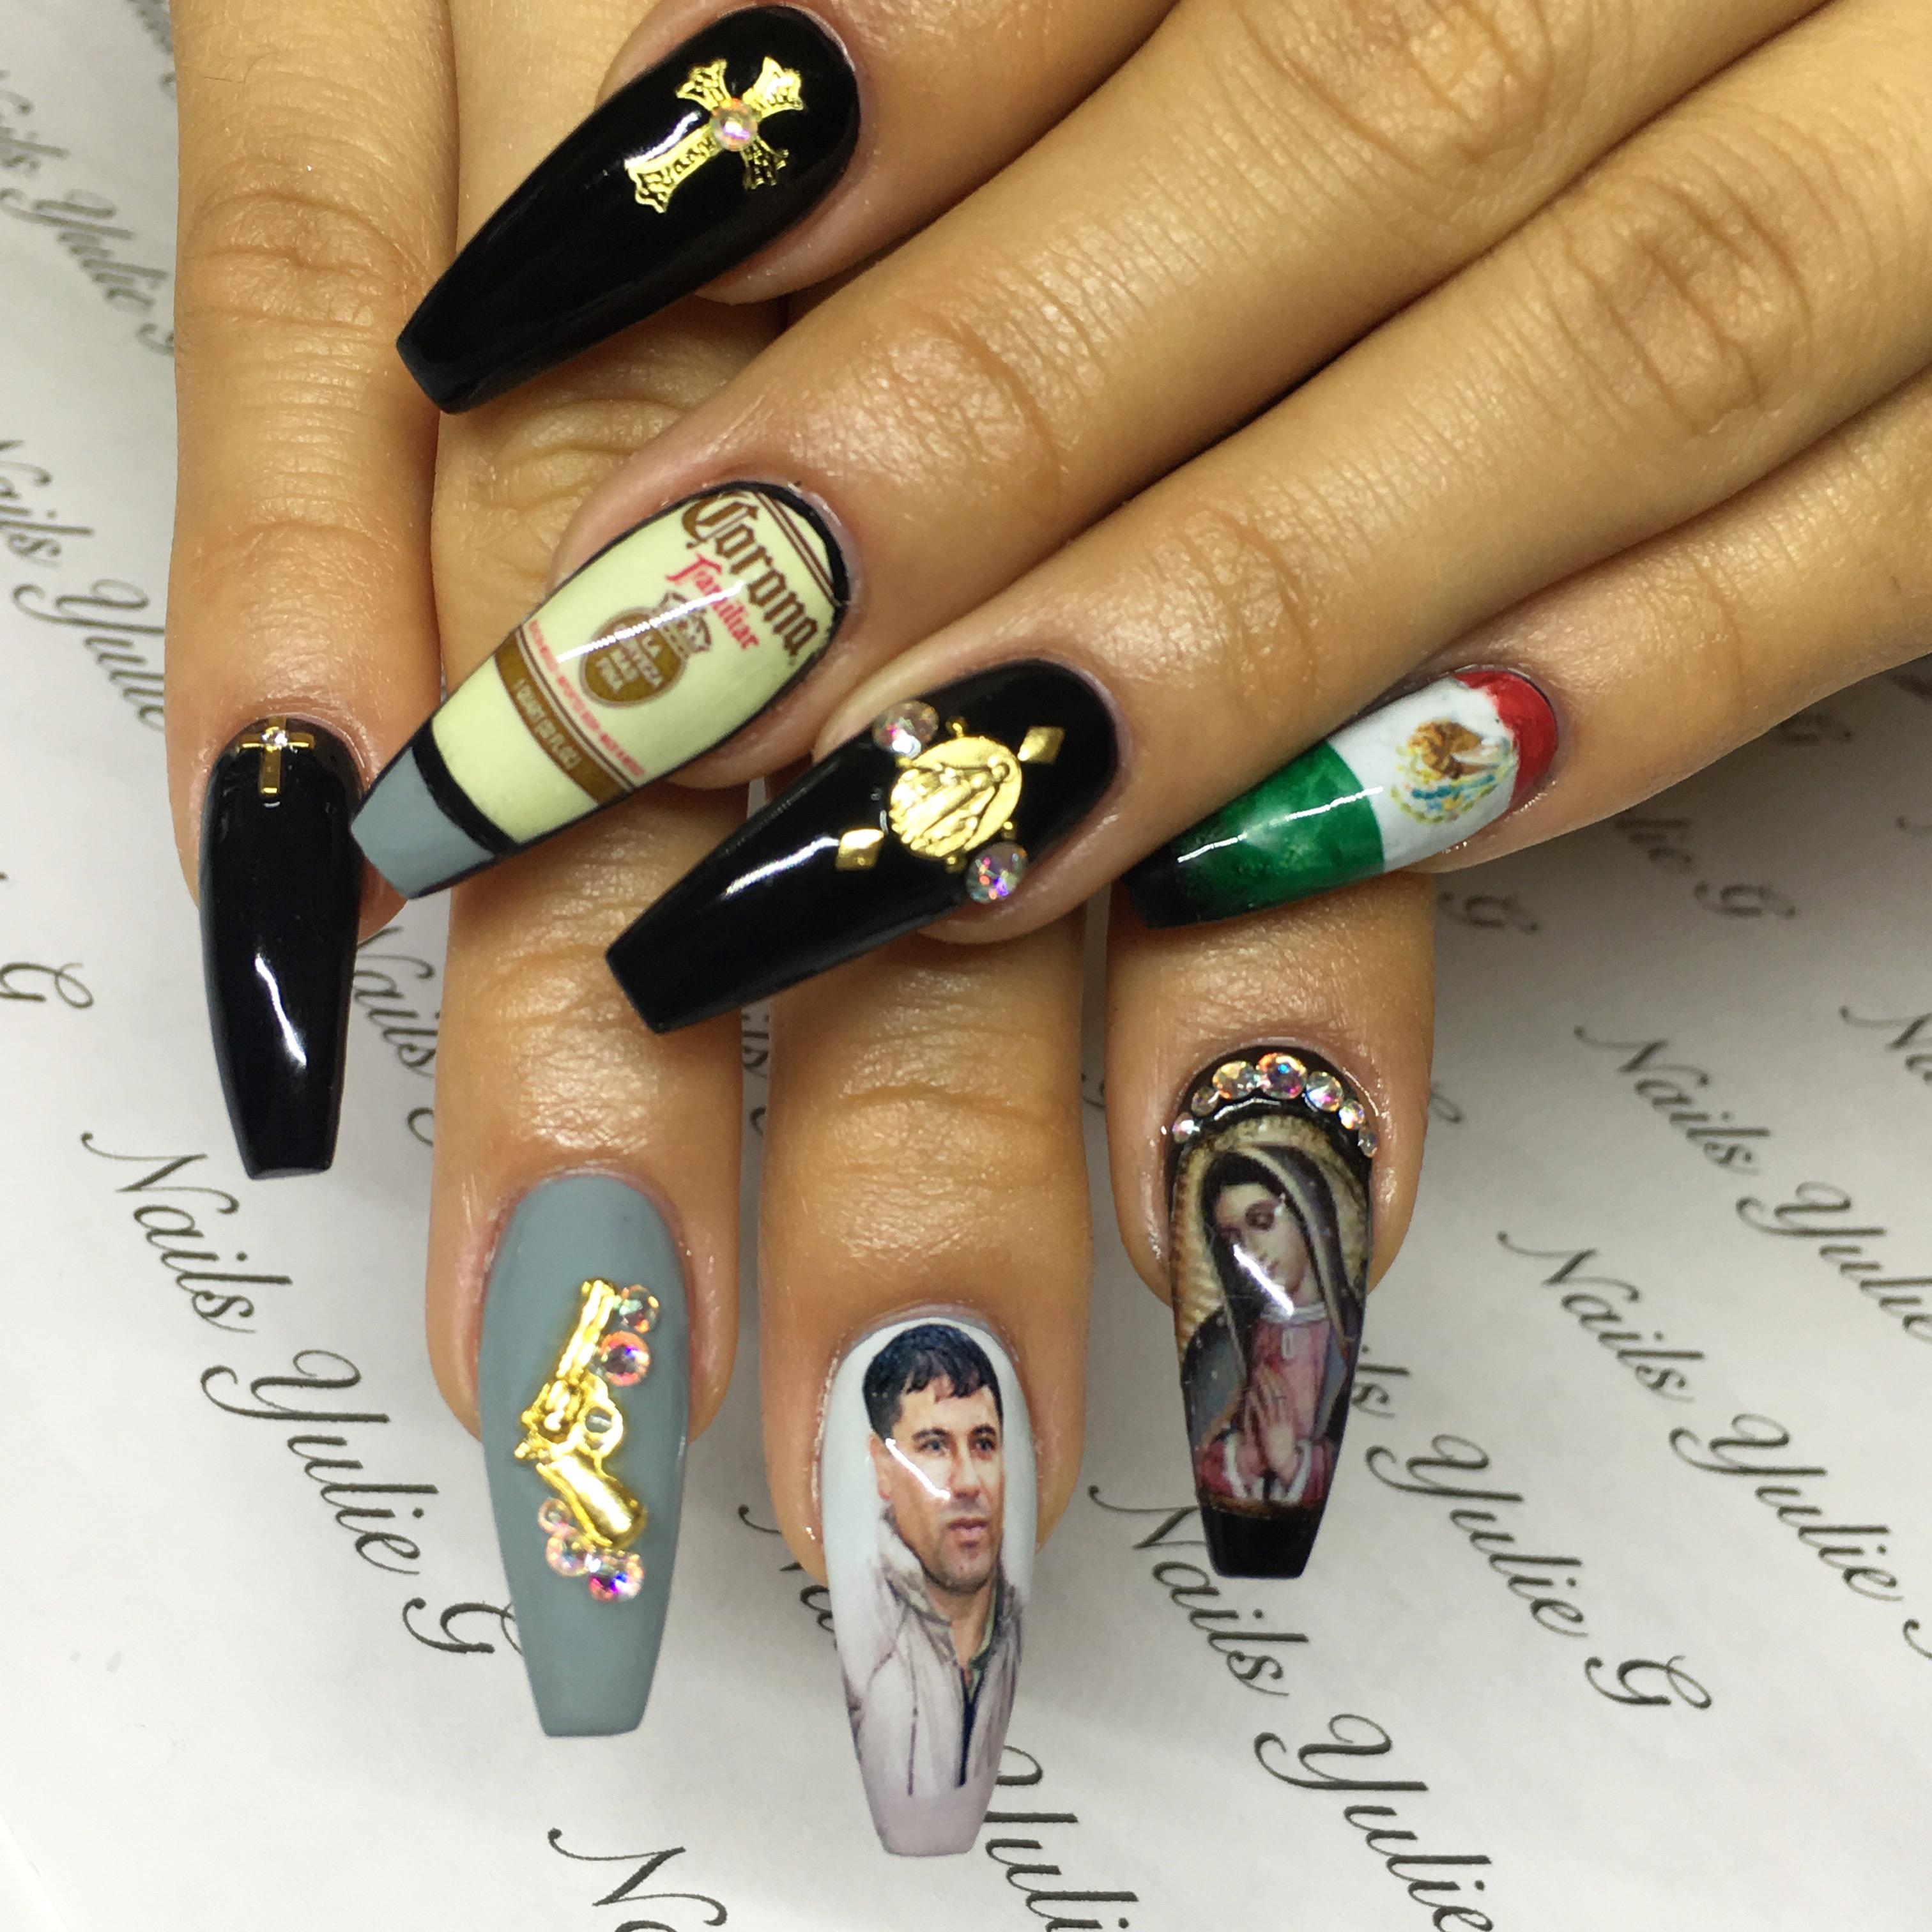 Inside the Ornate World of El Chapo Nail Art - VICE